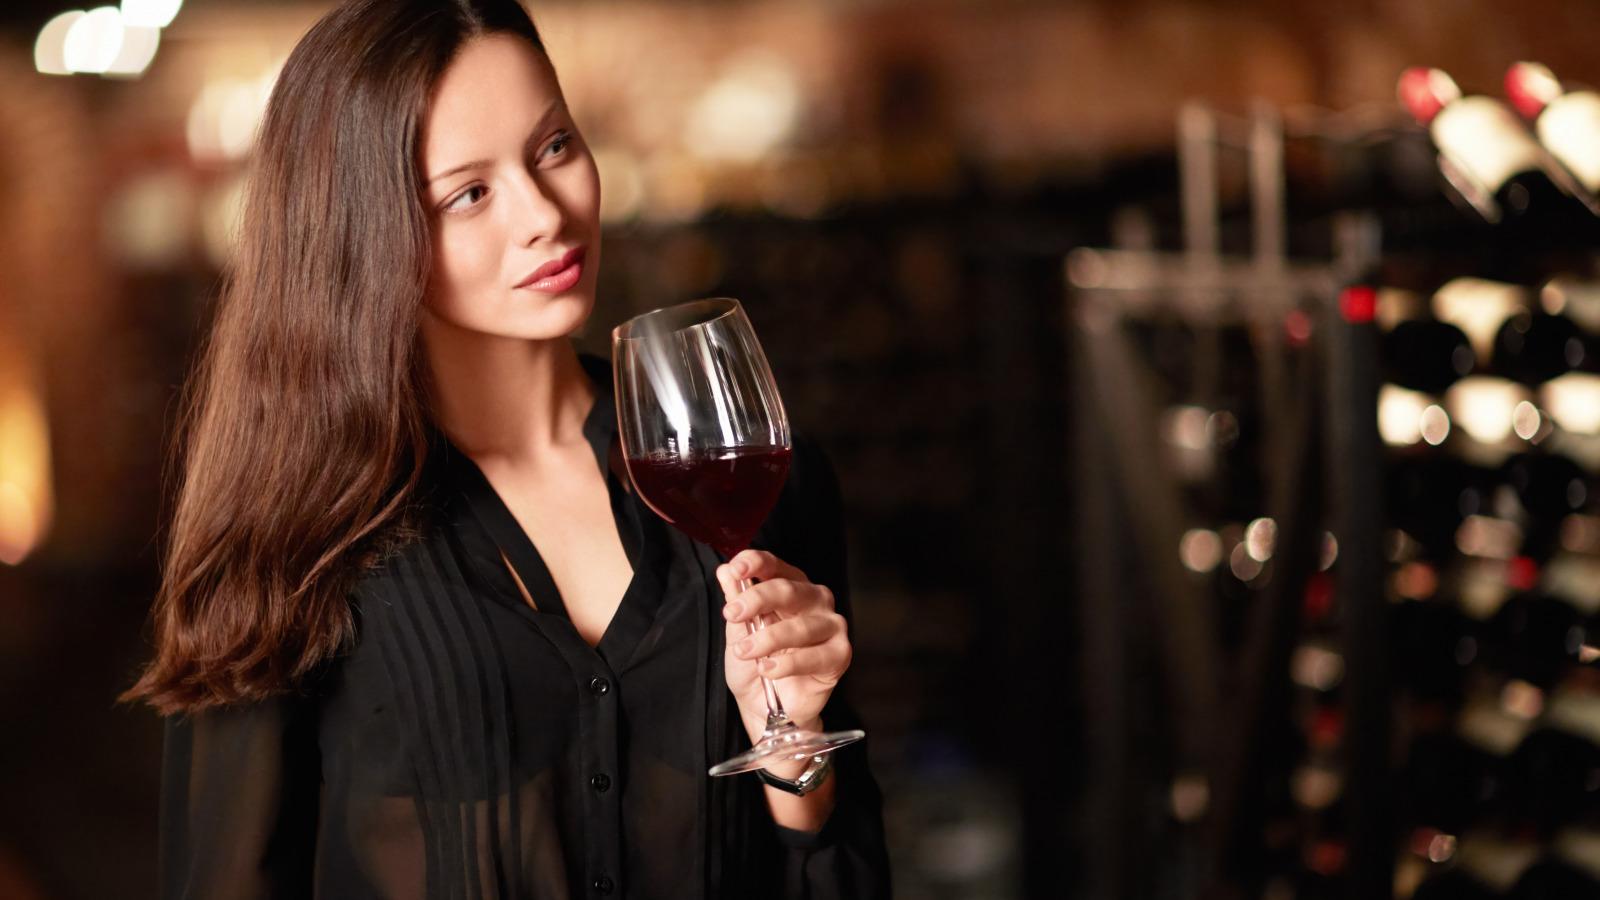 Падают, картинки про вино и девушек